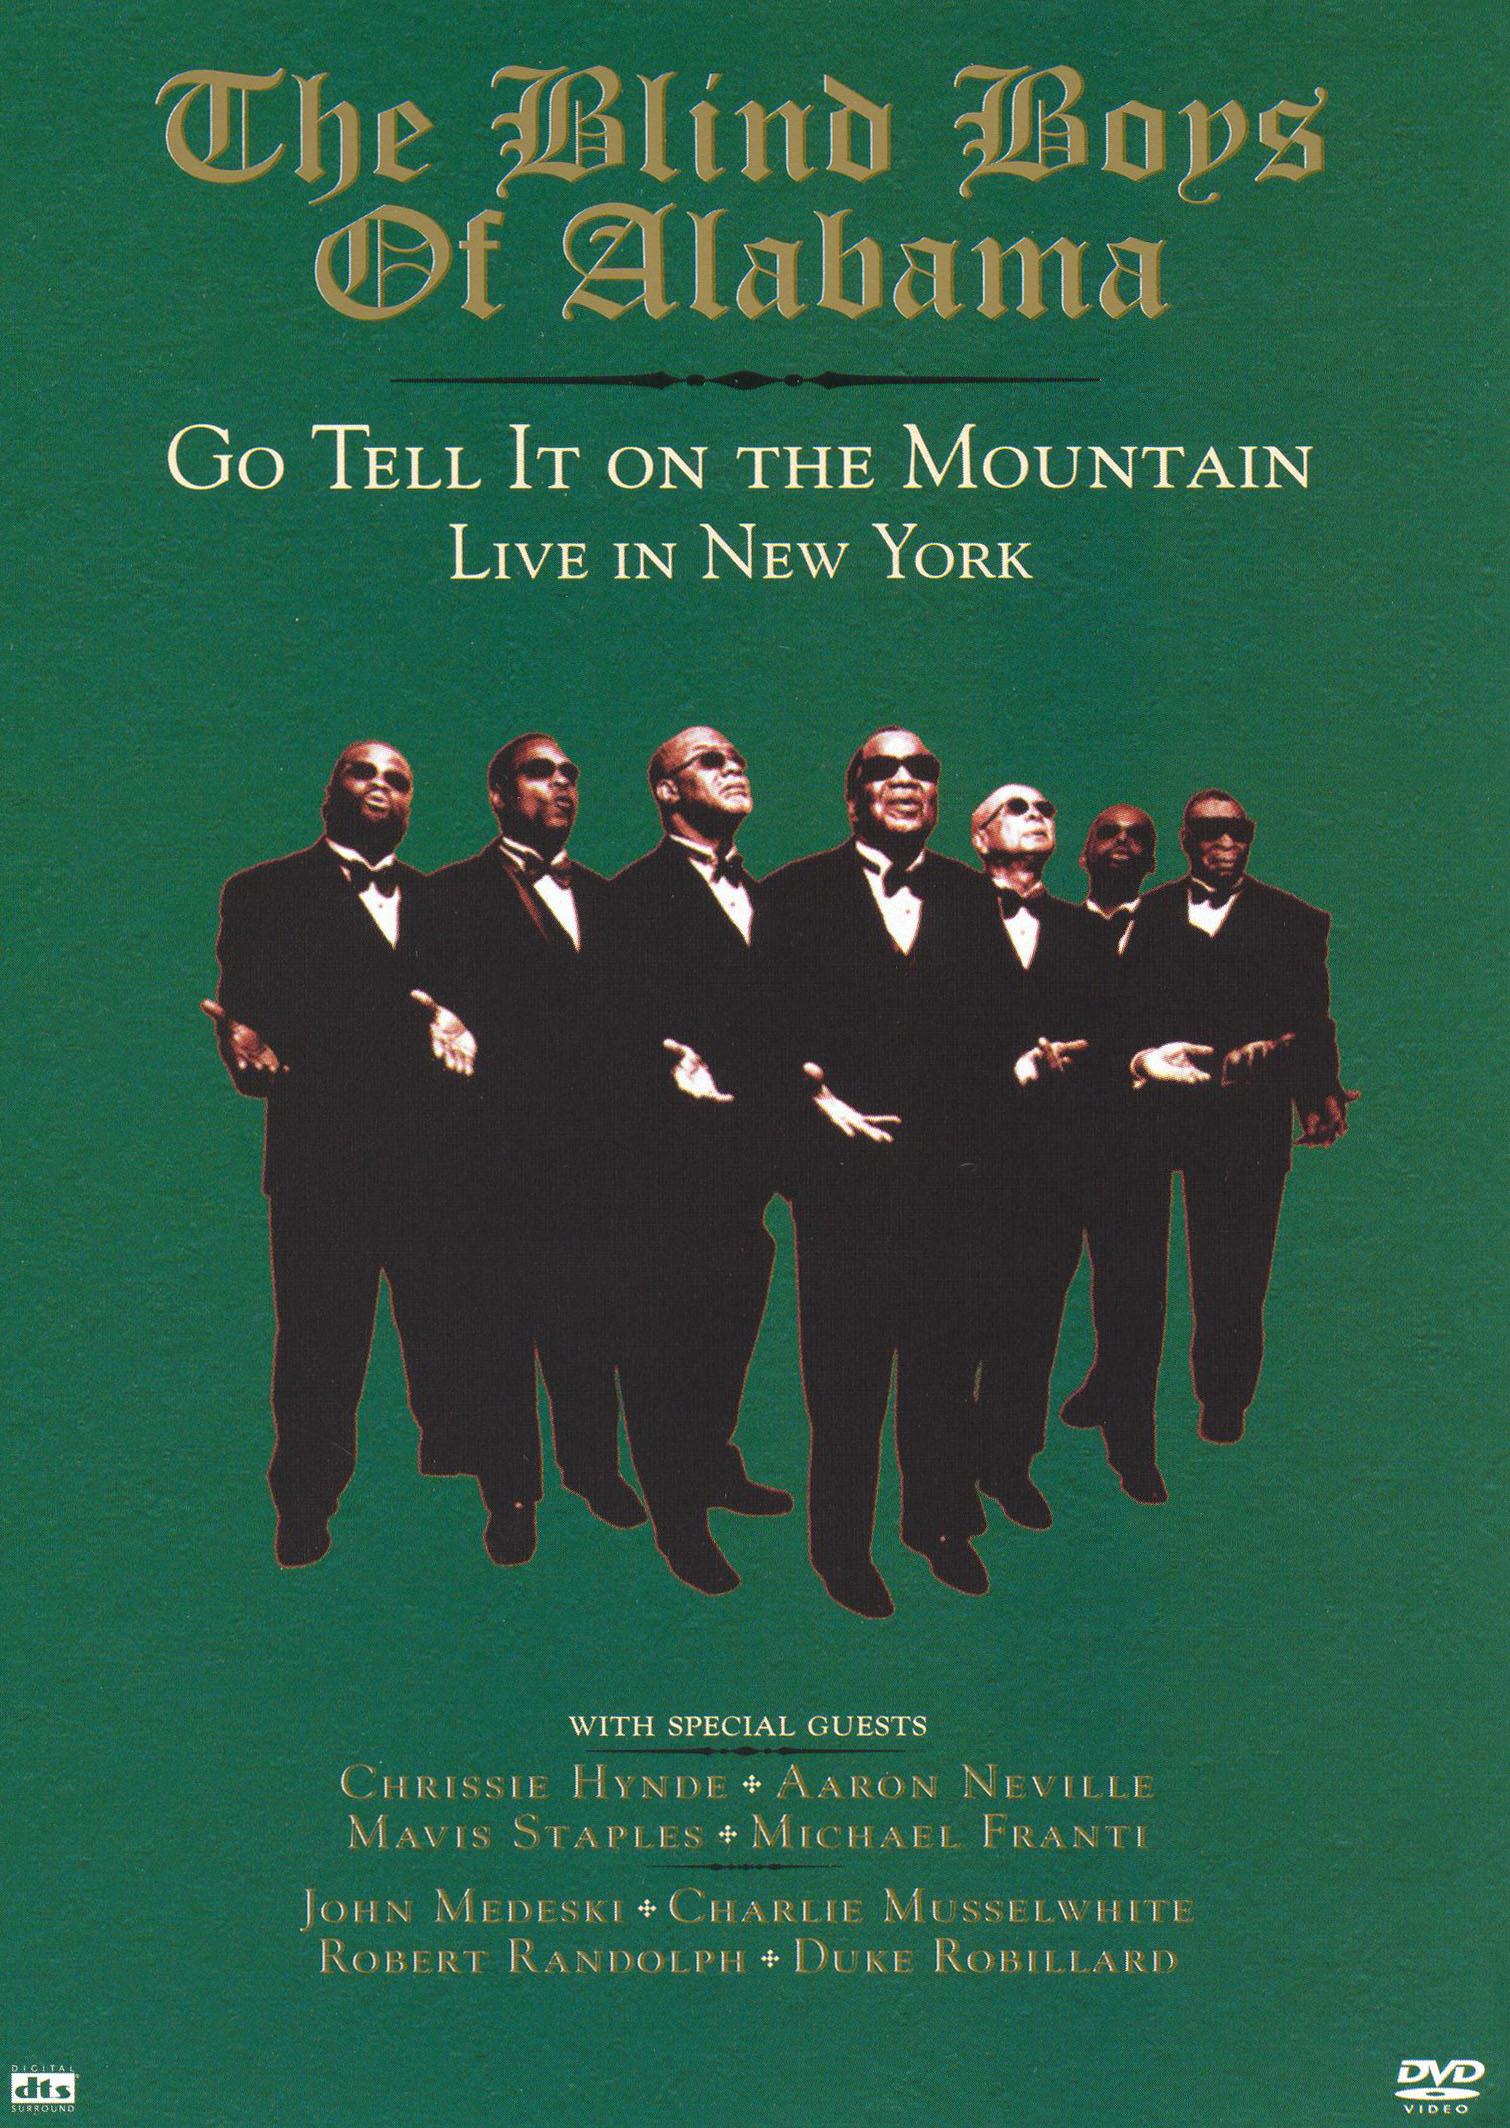 The Blind Boys of Alabama: Go Tell It on the Mountain Gospel